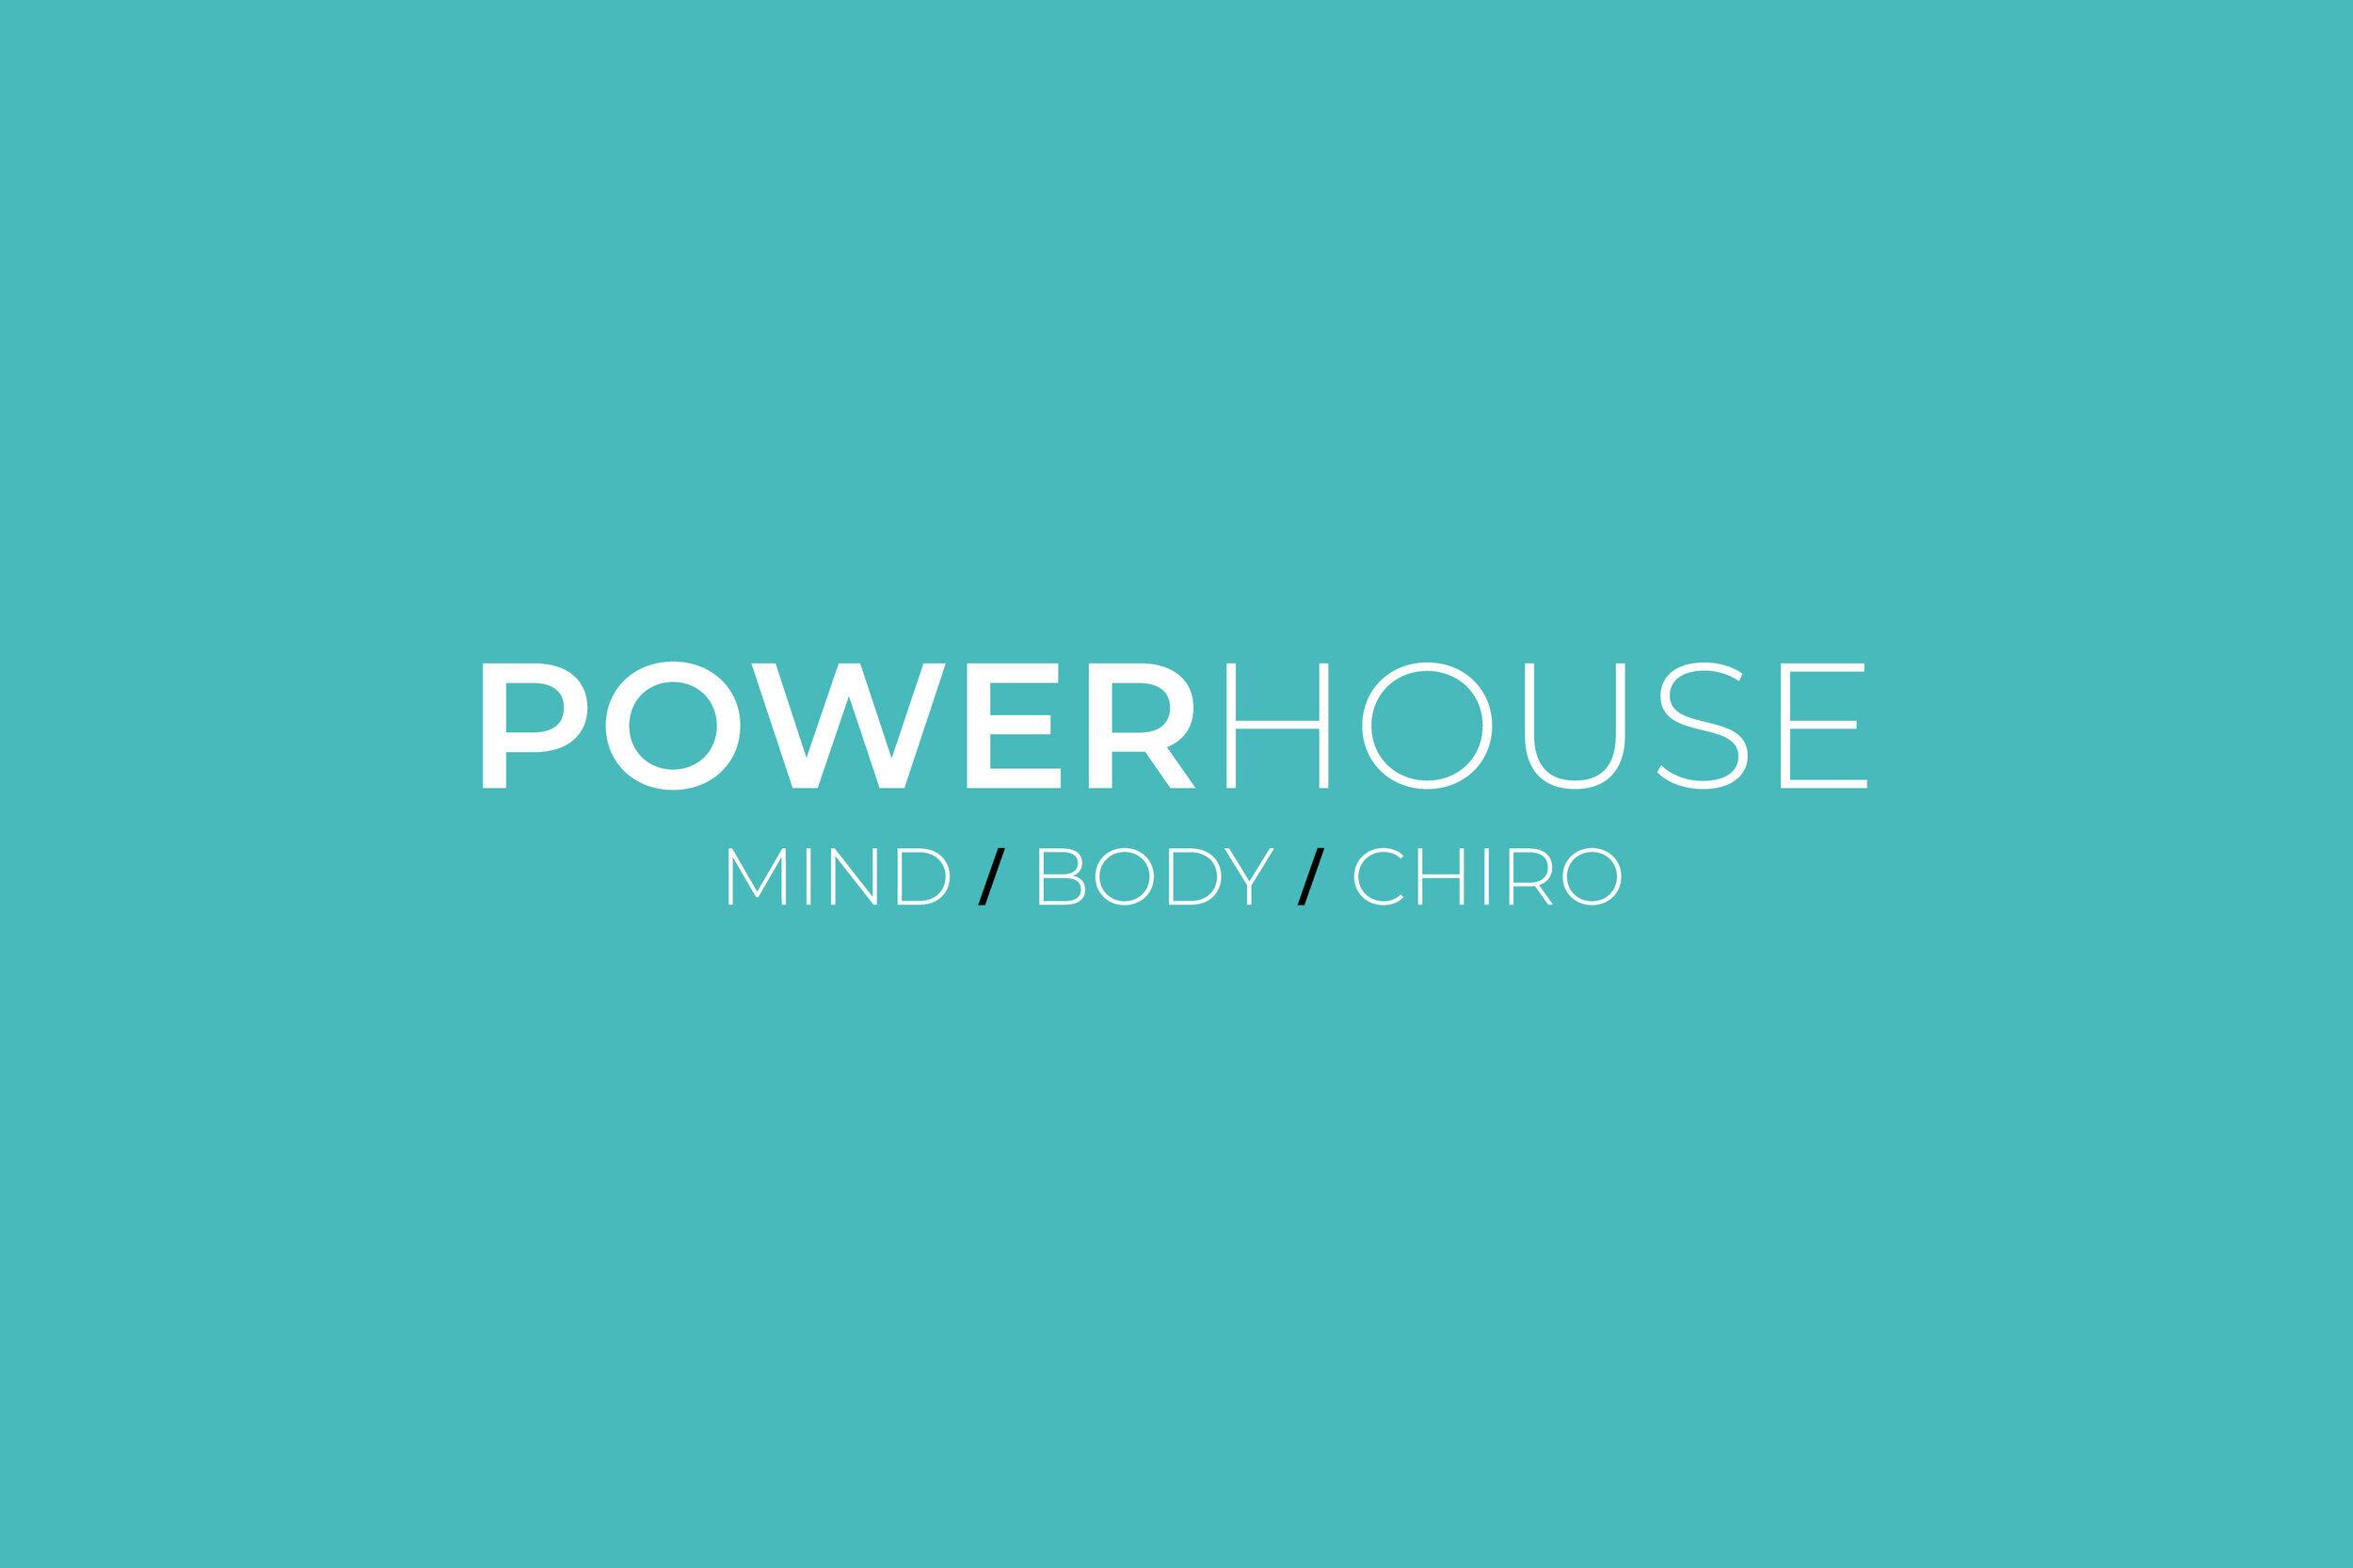 Potion+Creative+Powerhouse+Yoga+Mind+Body+Chiro (2).jpg